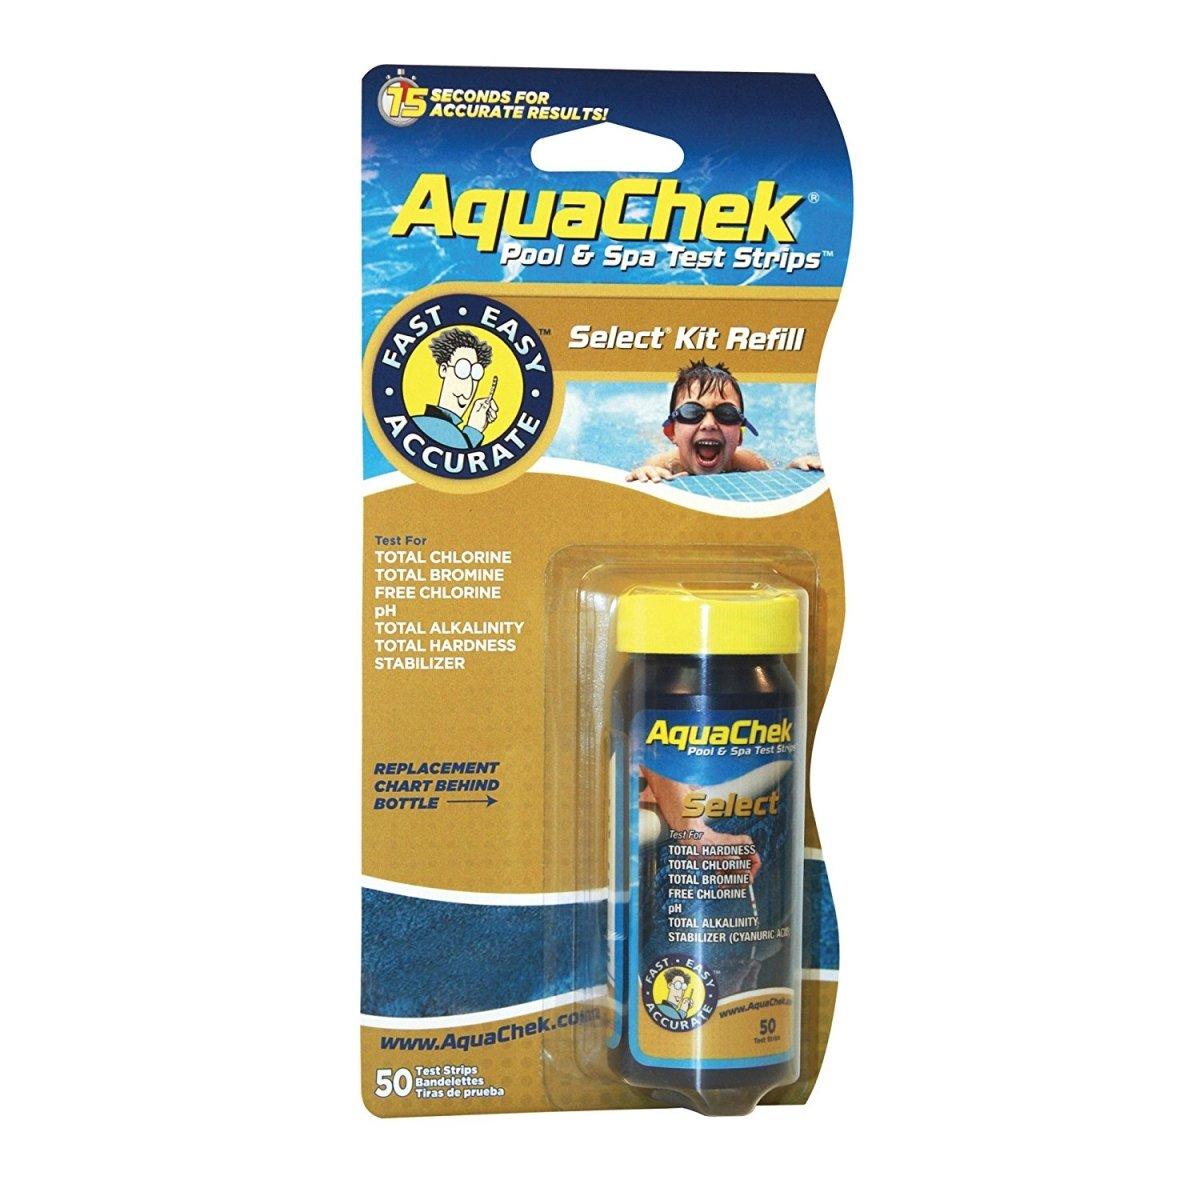 50) AQUACHEK Select Refill Swimming Pool Spa 7 Test Strips pH/Chlorine Aquacheck Color: 541640, Model: , Home & Garden Store